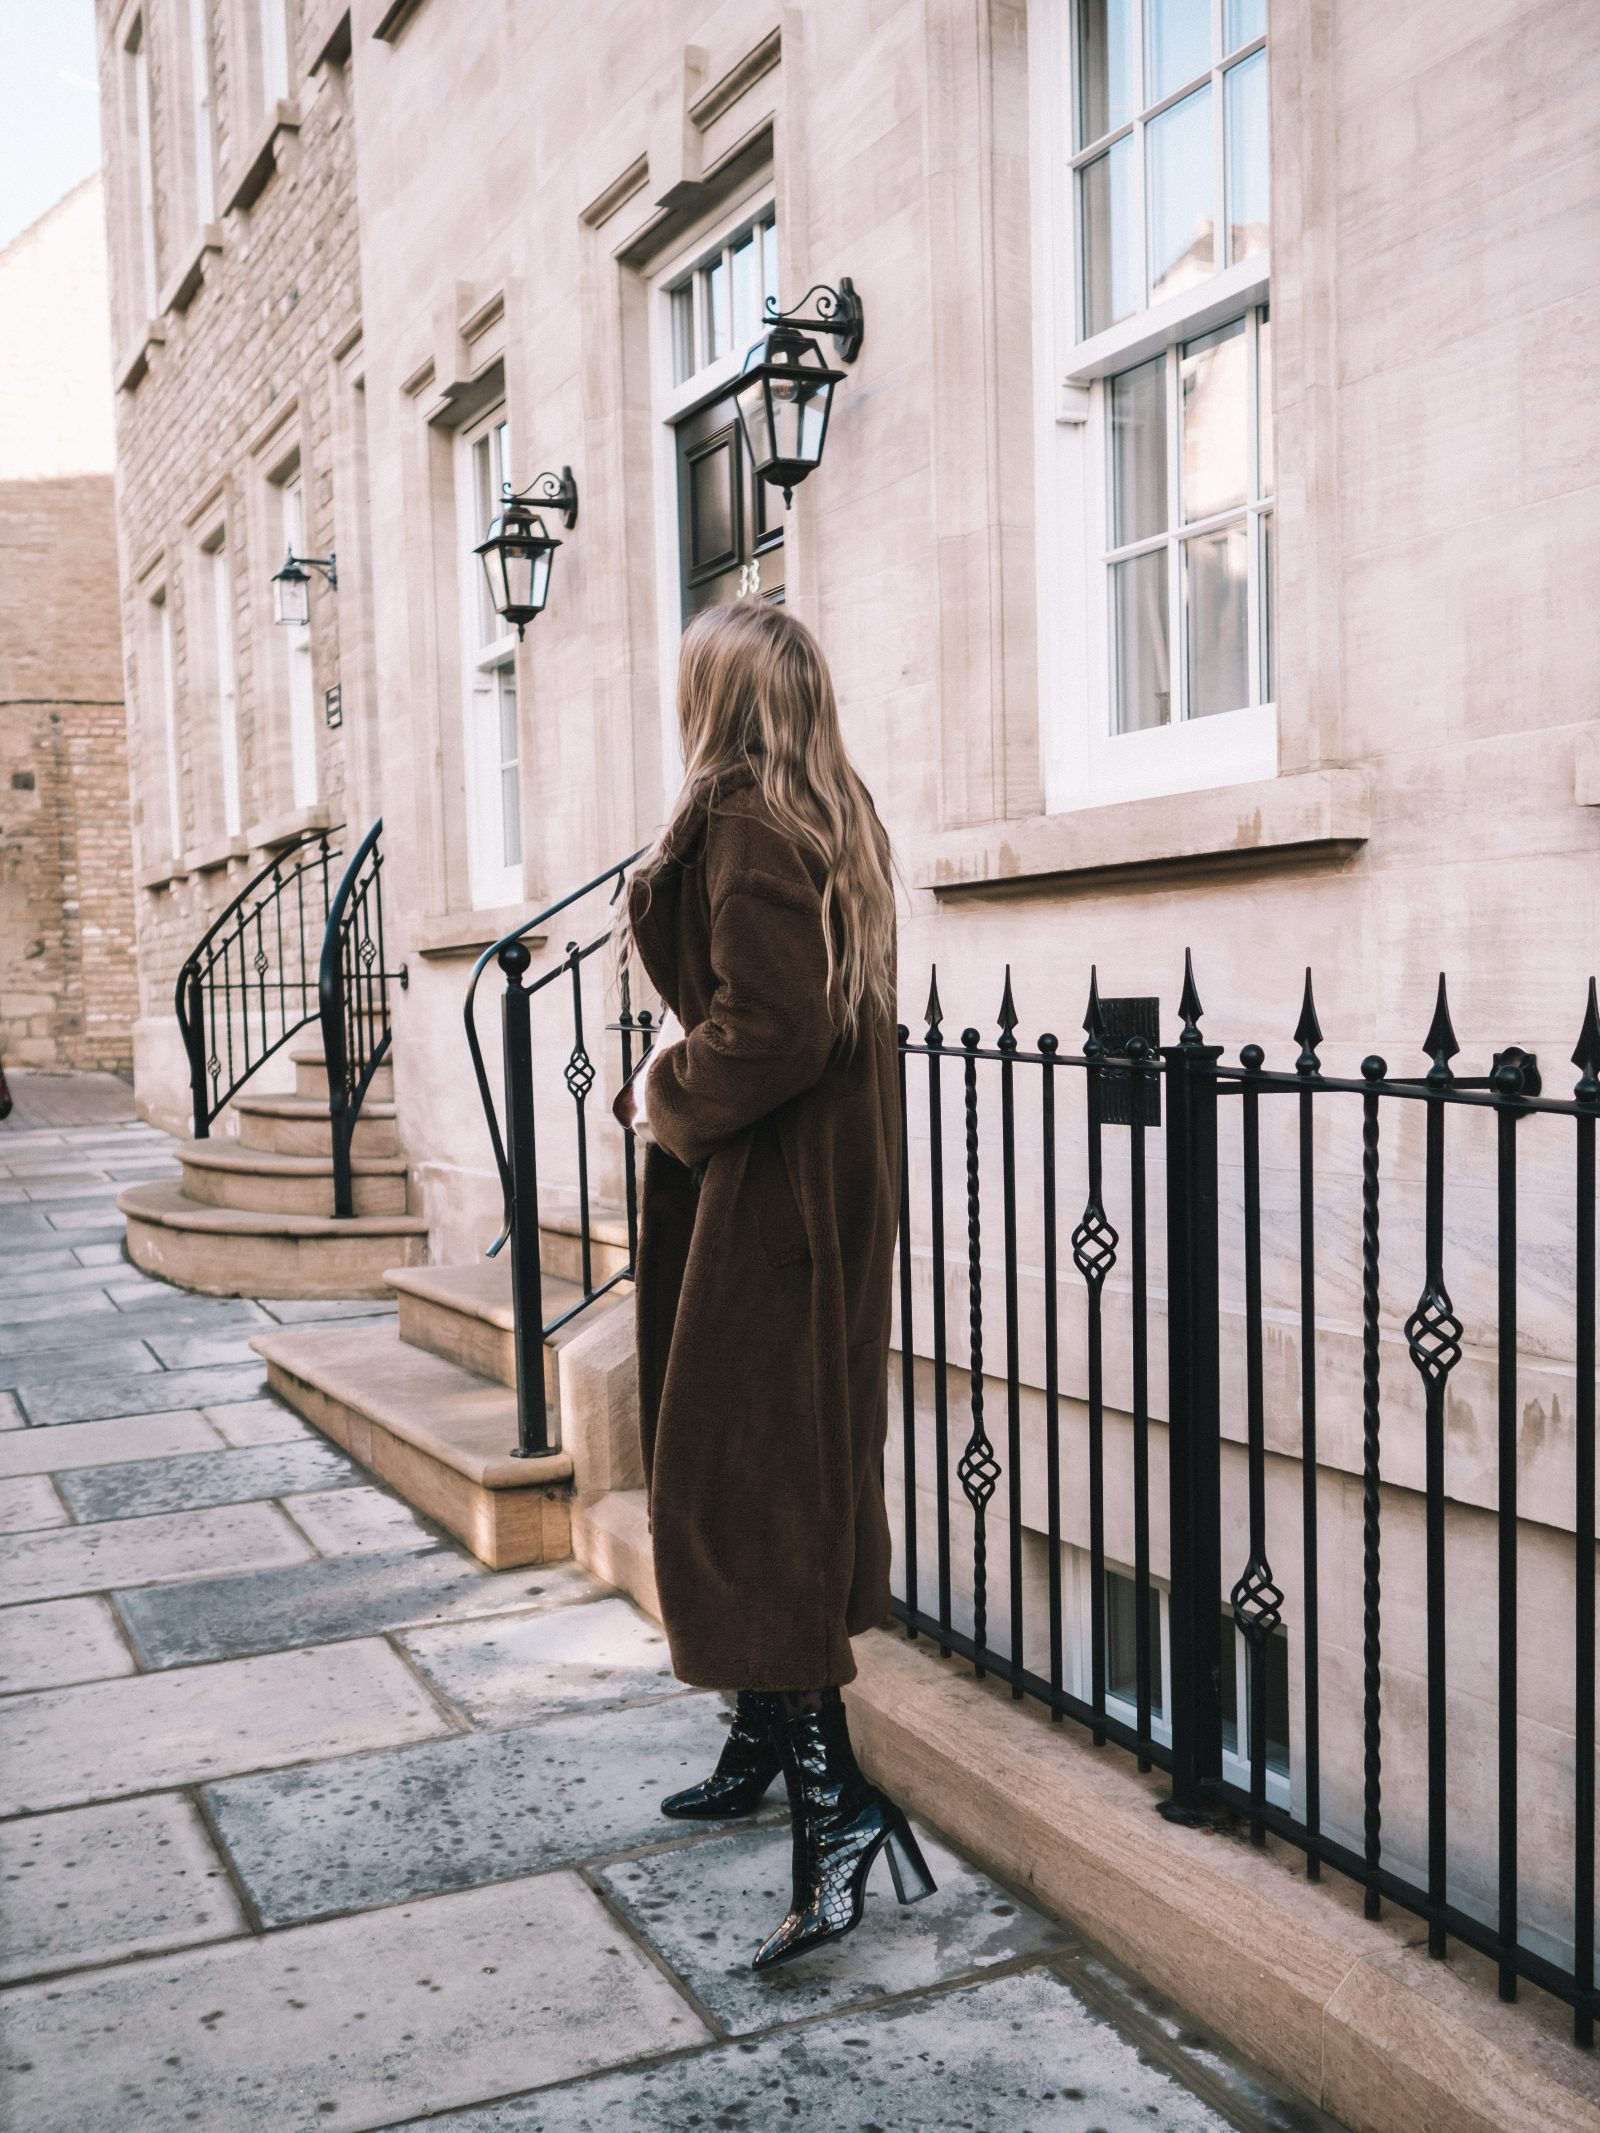 Warmest Coat - Faux Fur Maxi Coat - Sinead Crowe Autumn Street Style